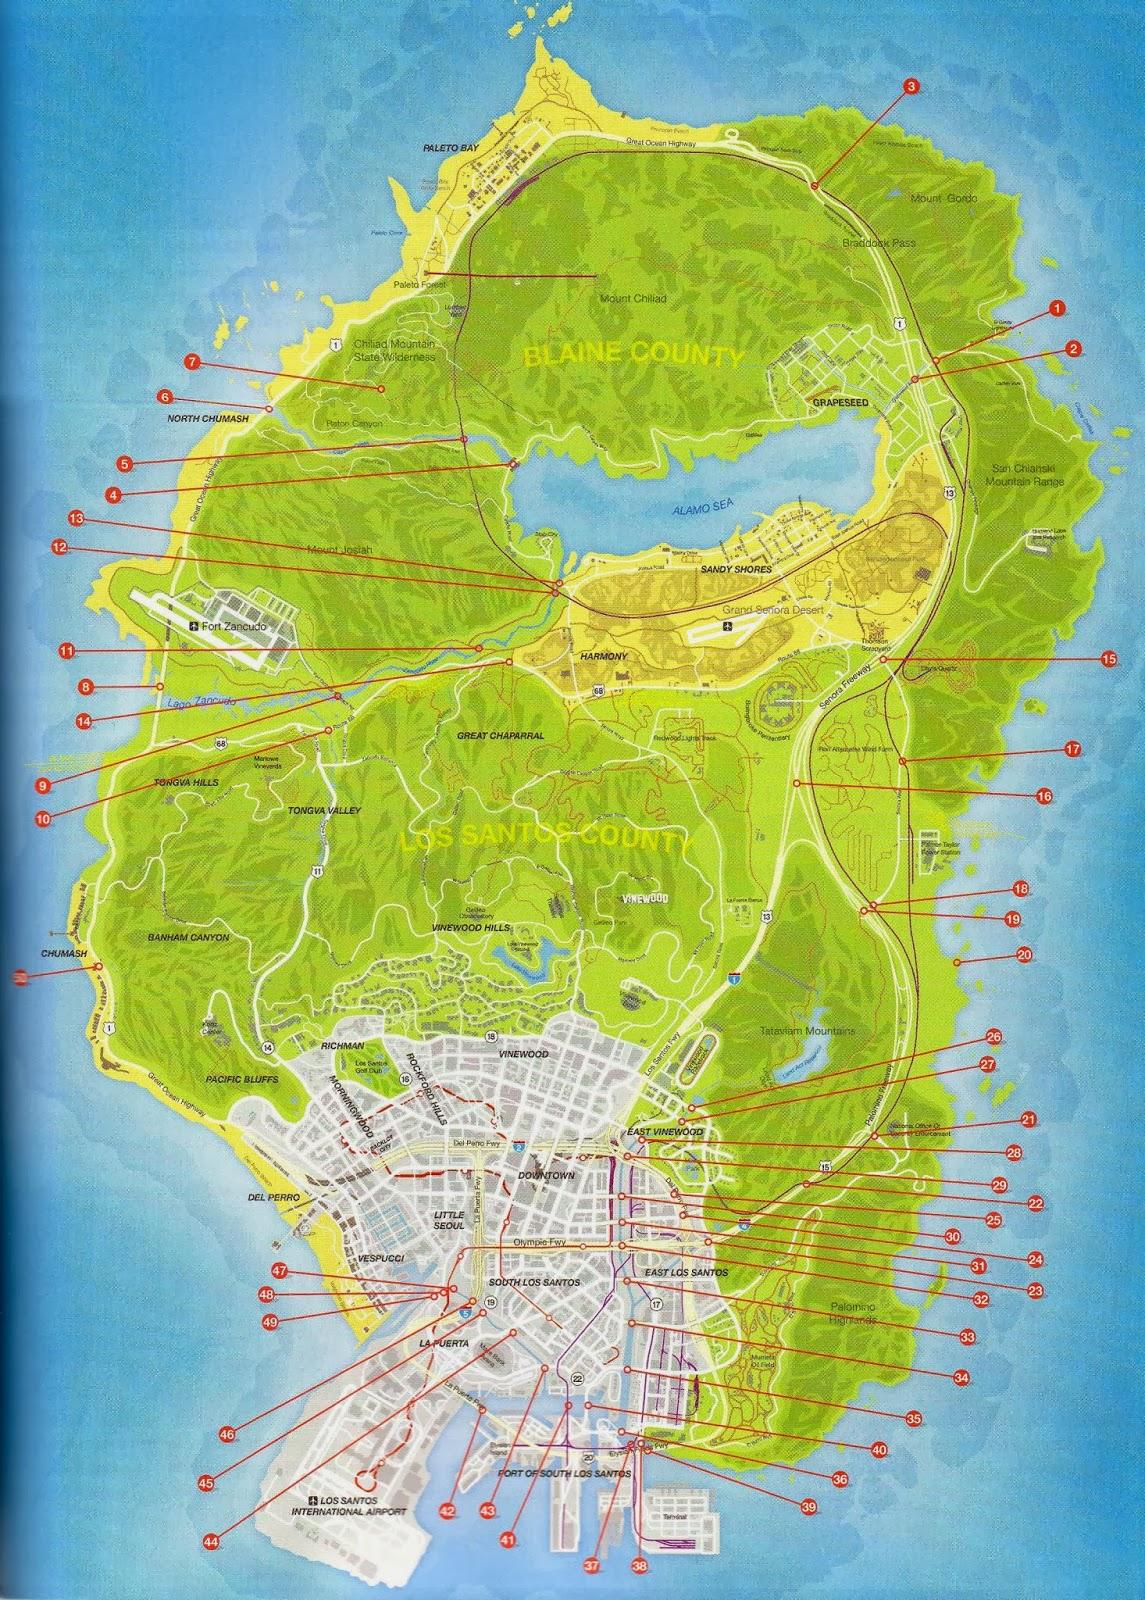 Maxresdefault in addition Ugnaoxv furthermore Gta Sa Secrets Map additionally Gtav Map Atlas Huge also Saintdenis   Optimal. on gta 4 secret locations map